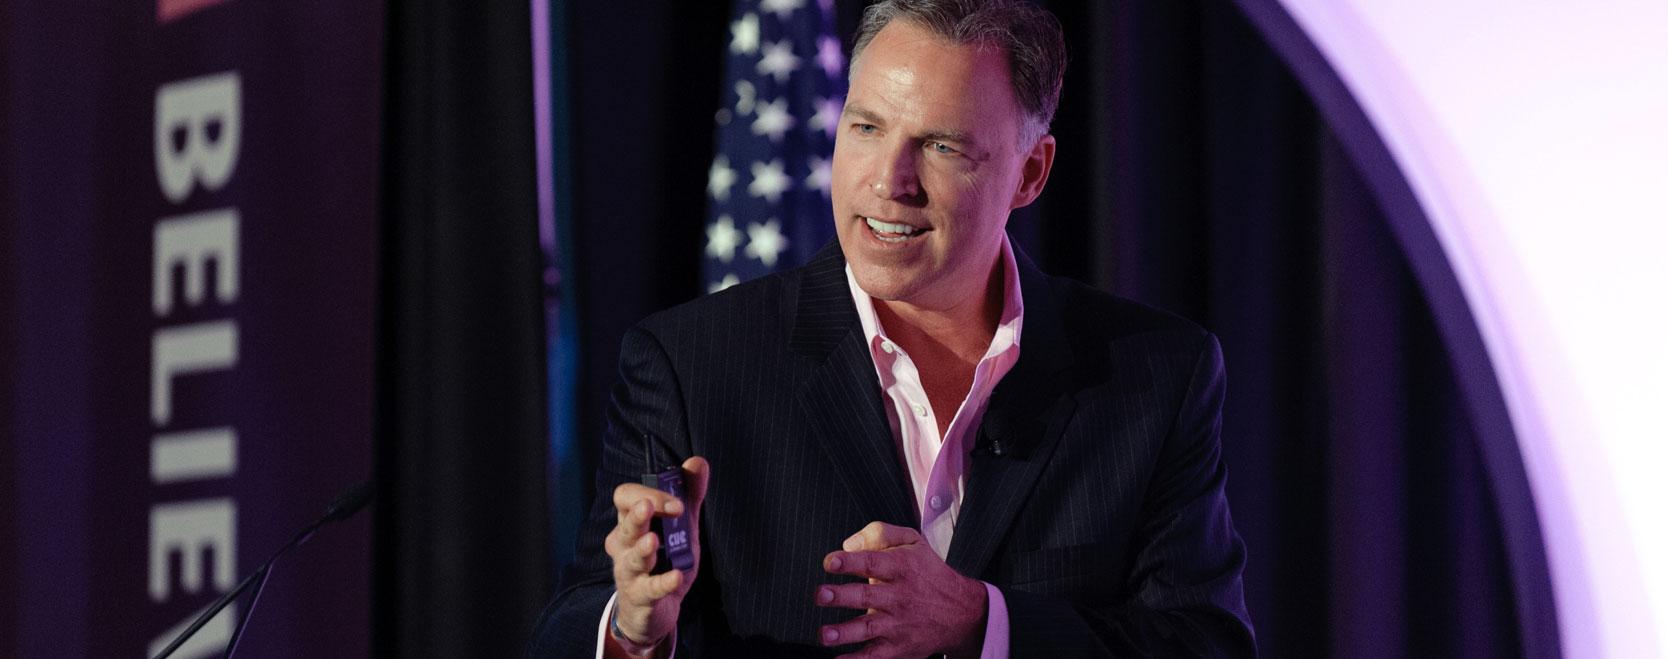 Larry Broughton - speaker